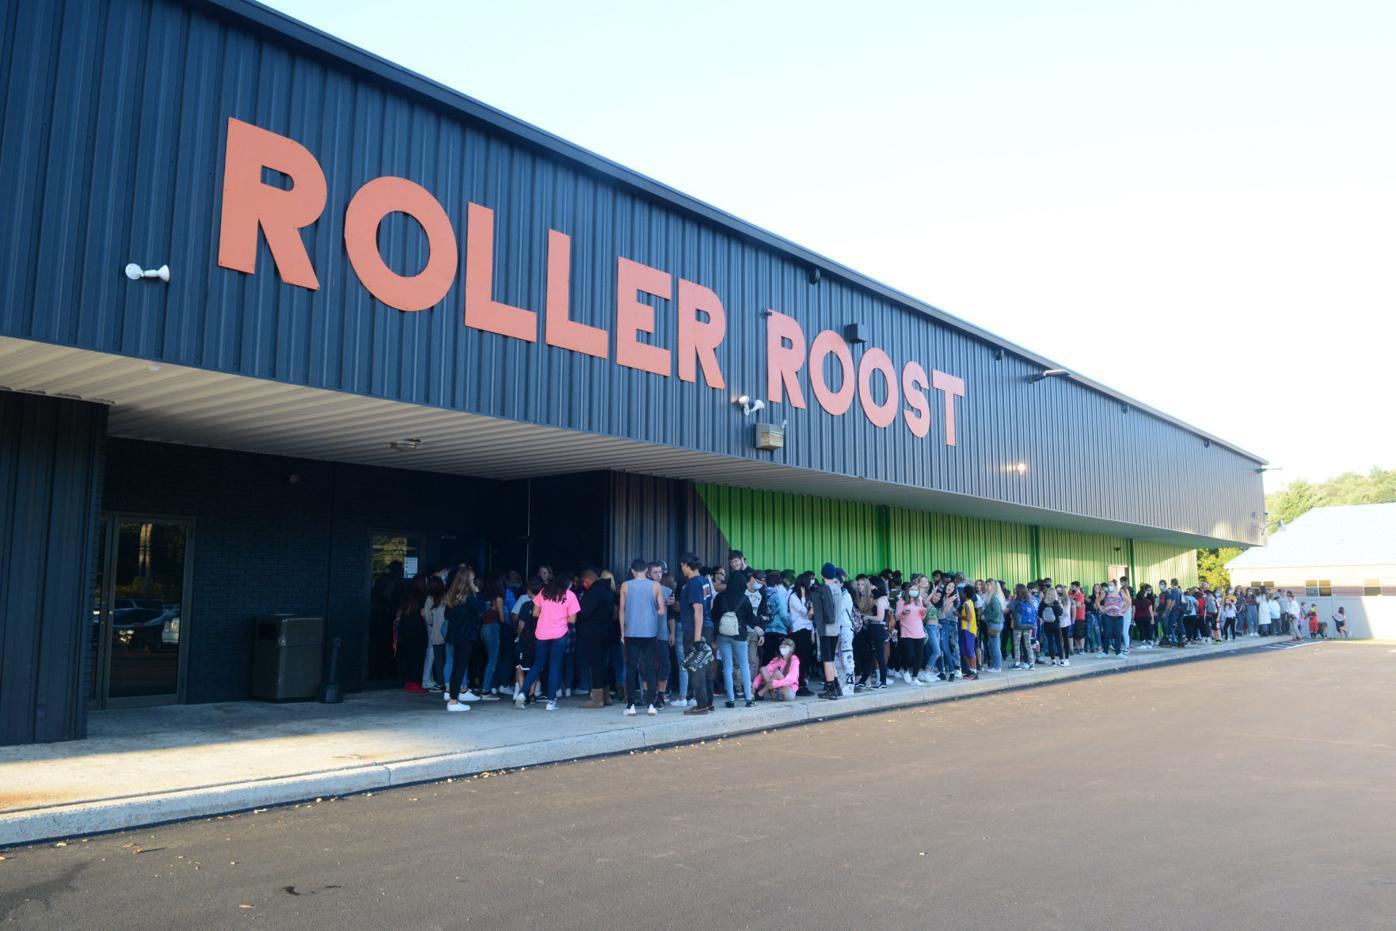 Roller Roost